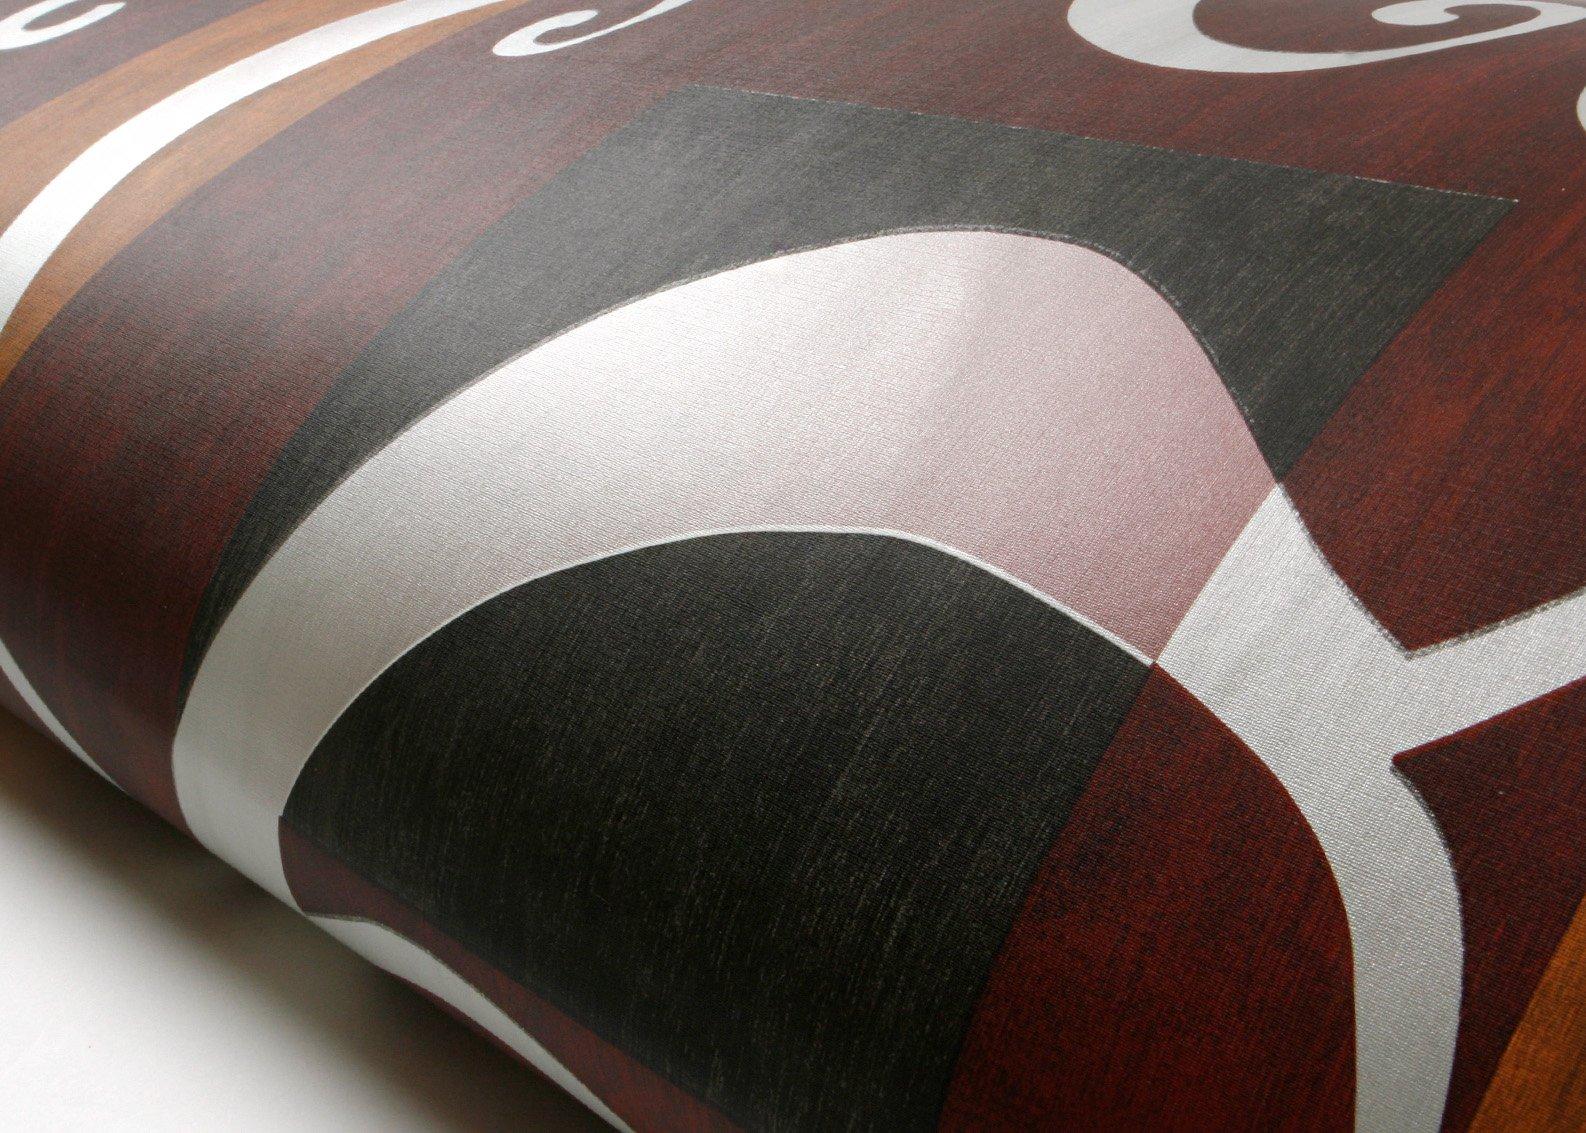 ROSEROSA Peel & Stick Backsplash Papyrus Victoria Damask Oriental Paper Textured Vinyl Contact paper Interior Film Shelf Liner Table and Door Reform (FP9143-2 : 2.00 Feet X 6.56 Feet)